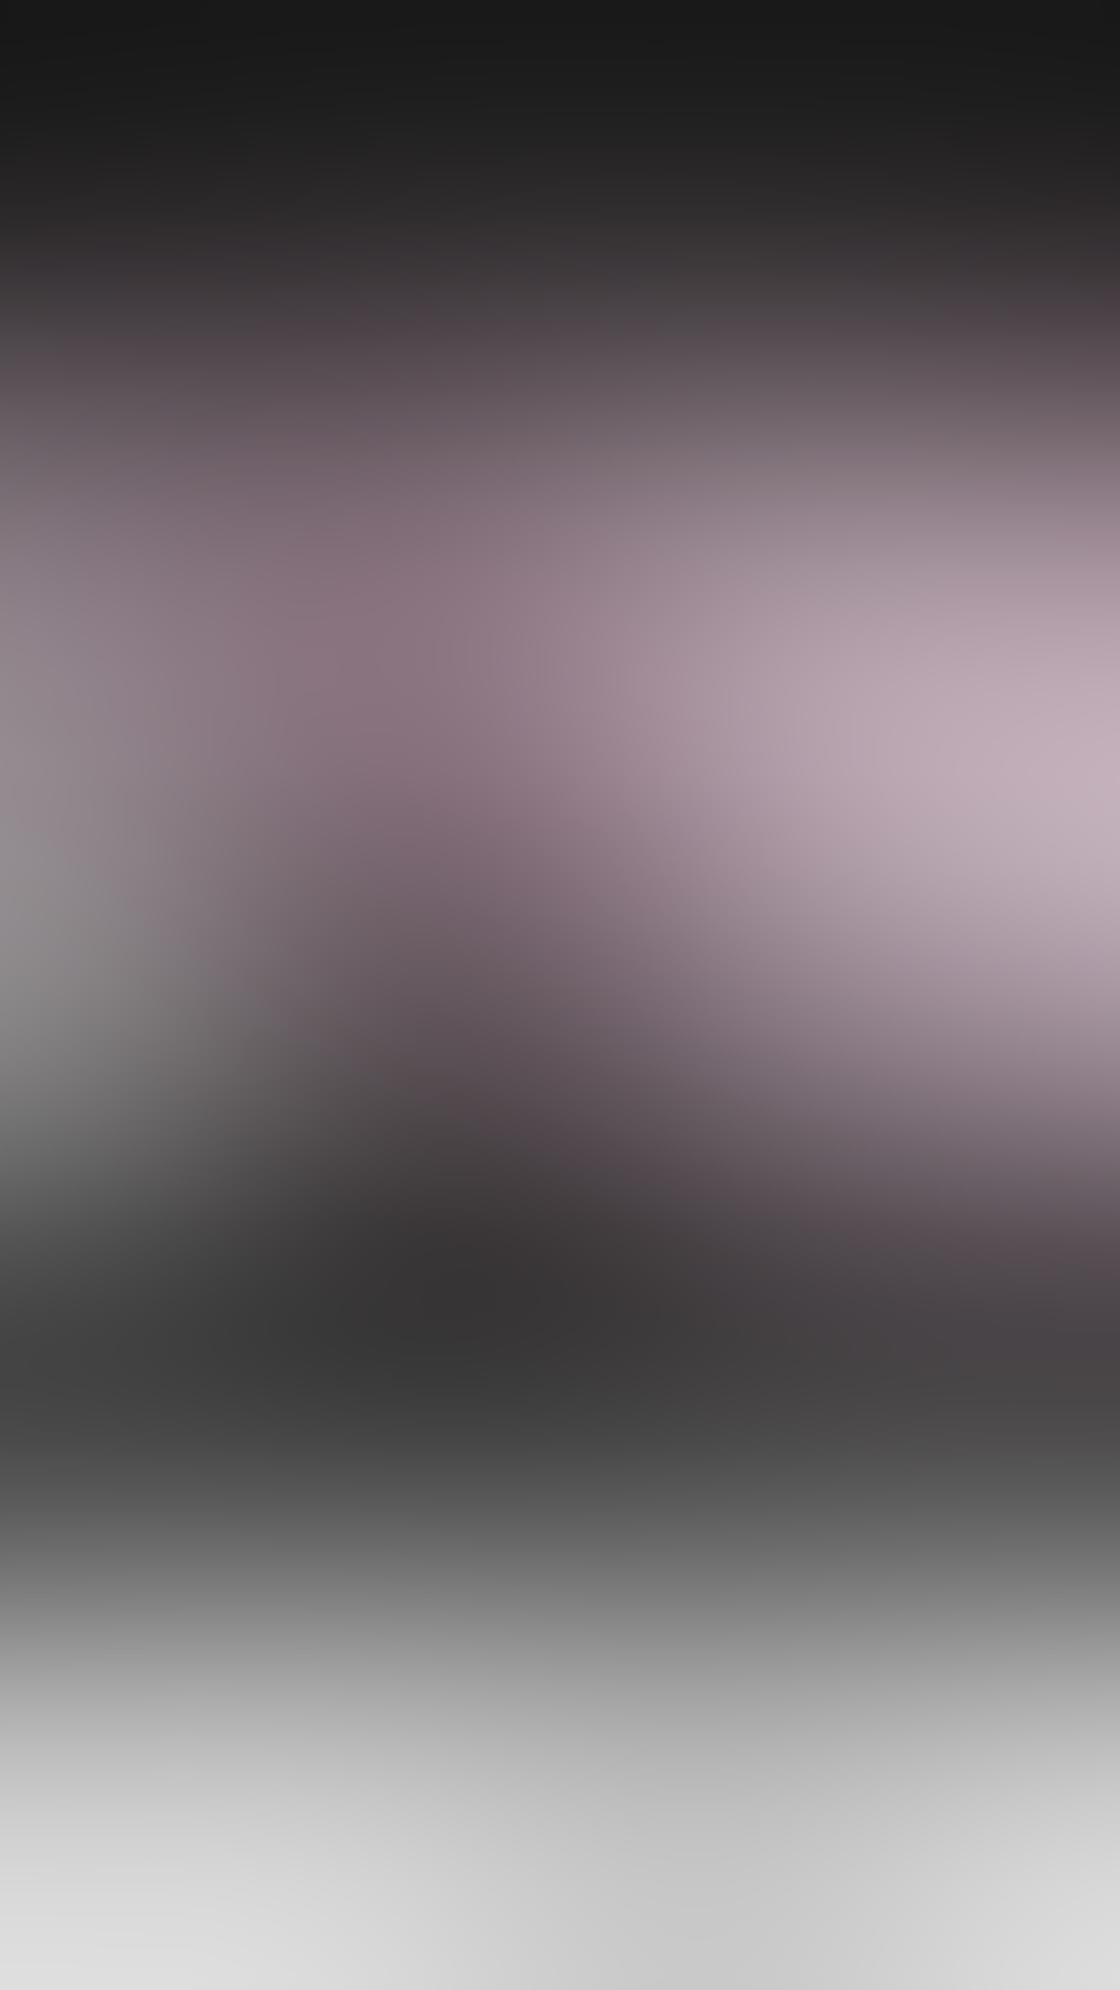 Lens Distortions iPhone App 5